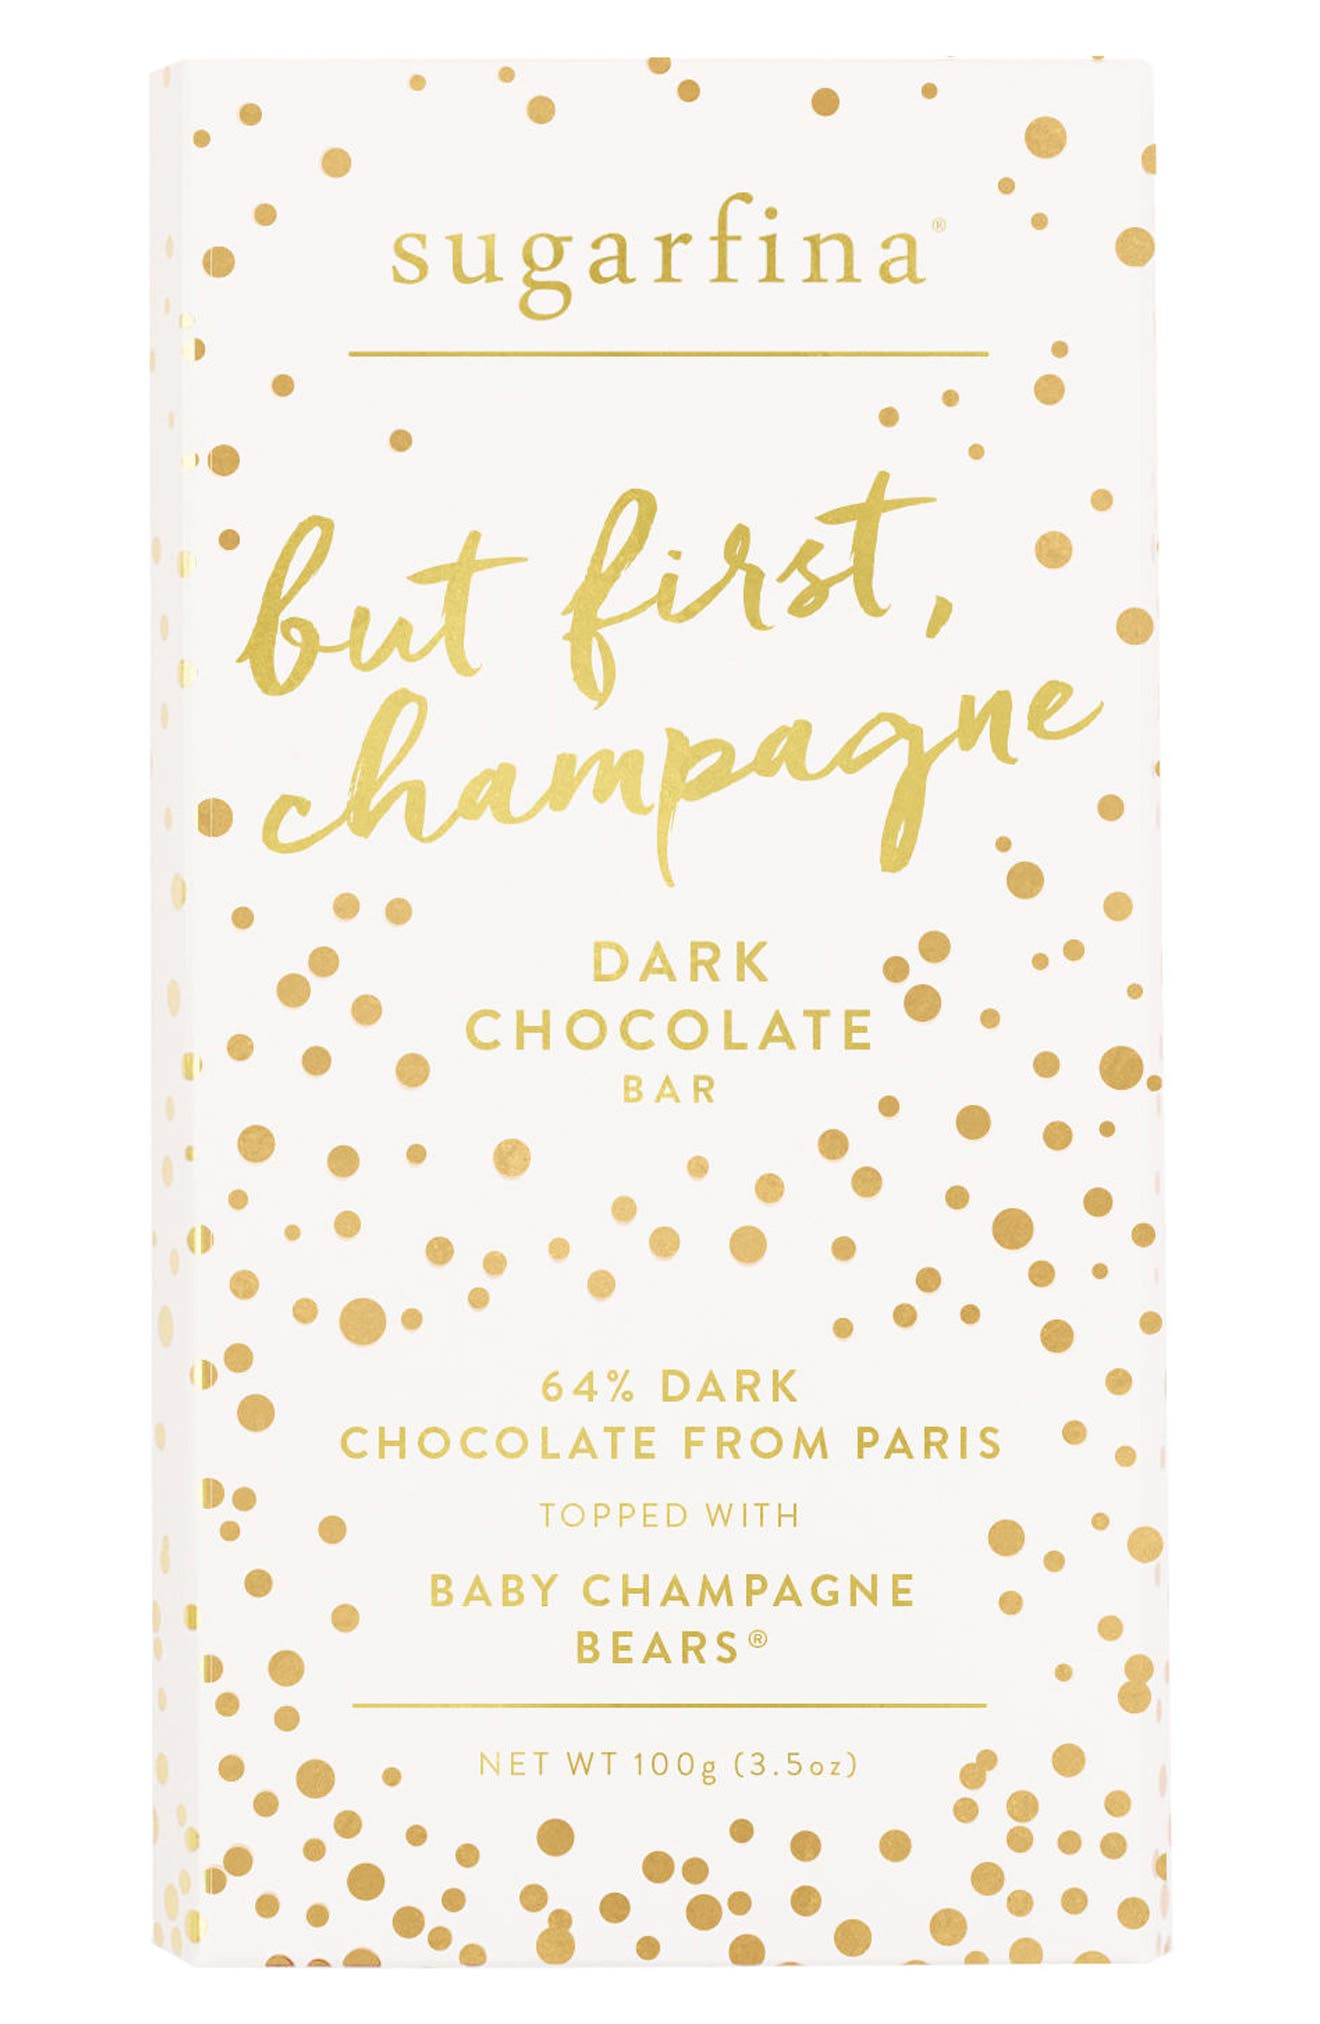 2-Pack Dark Chocolate Champagne Bears Bars,                             Main thumbnail 1, color,                             650